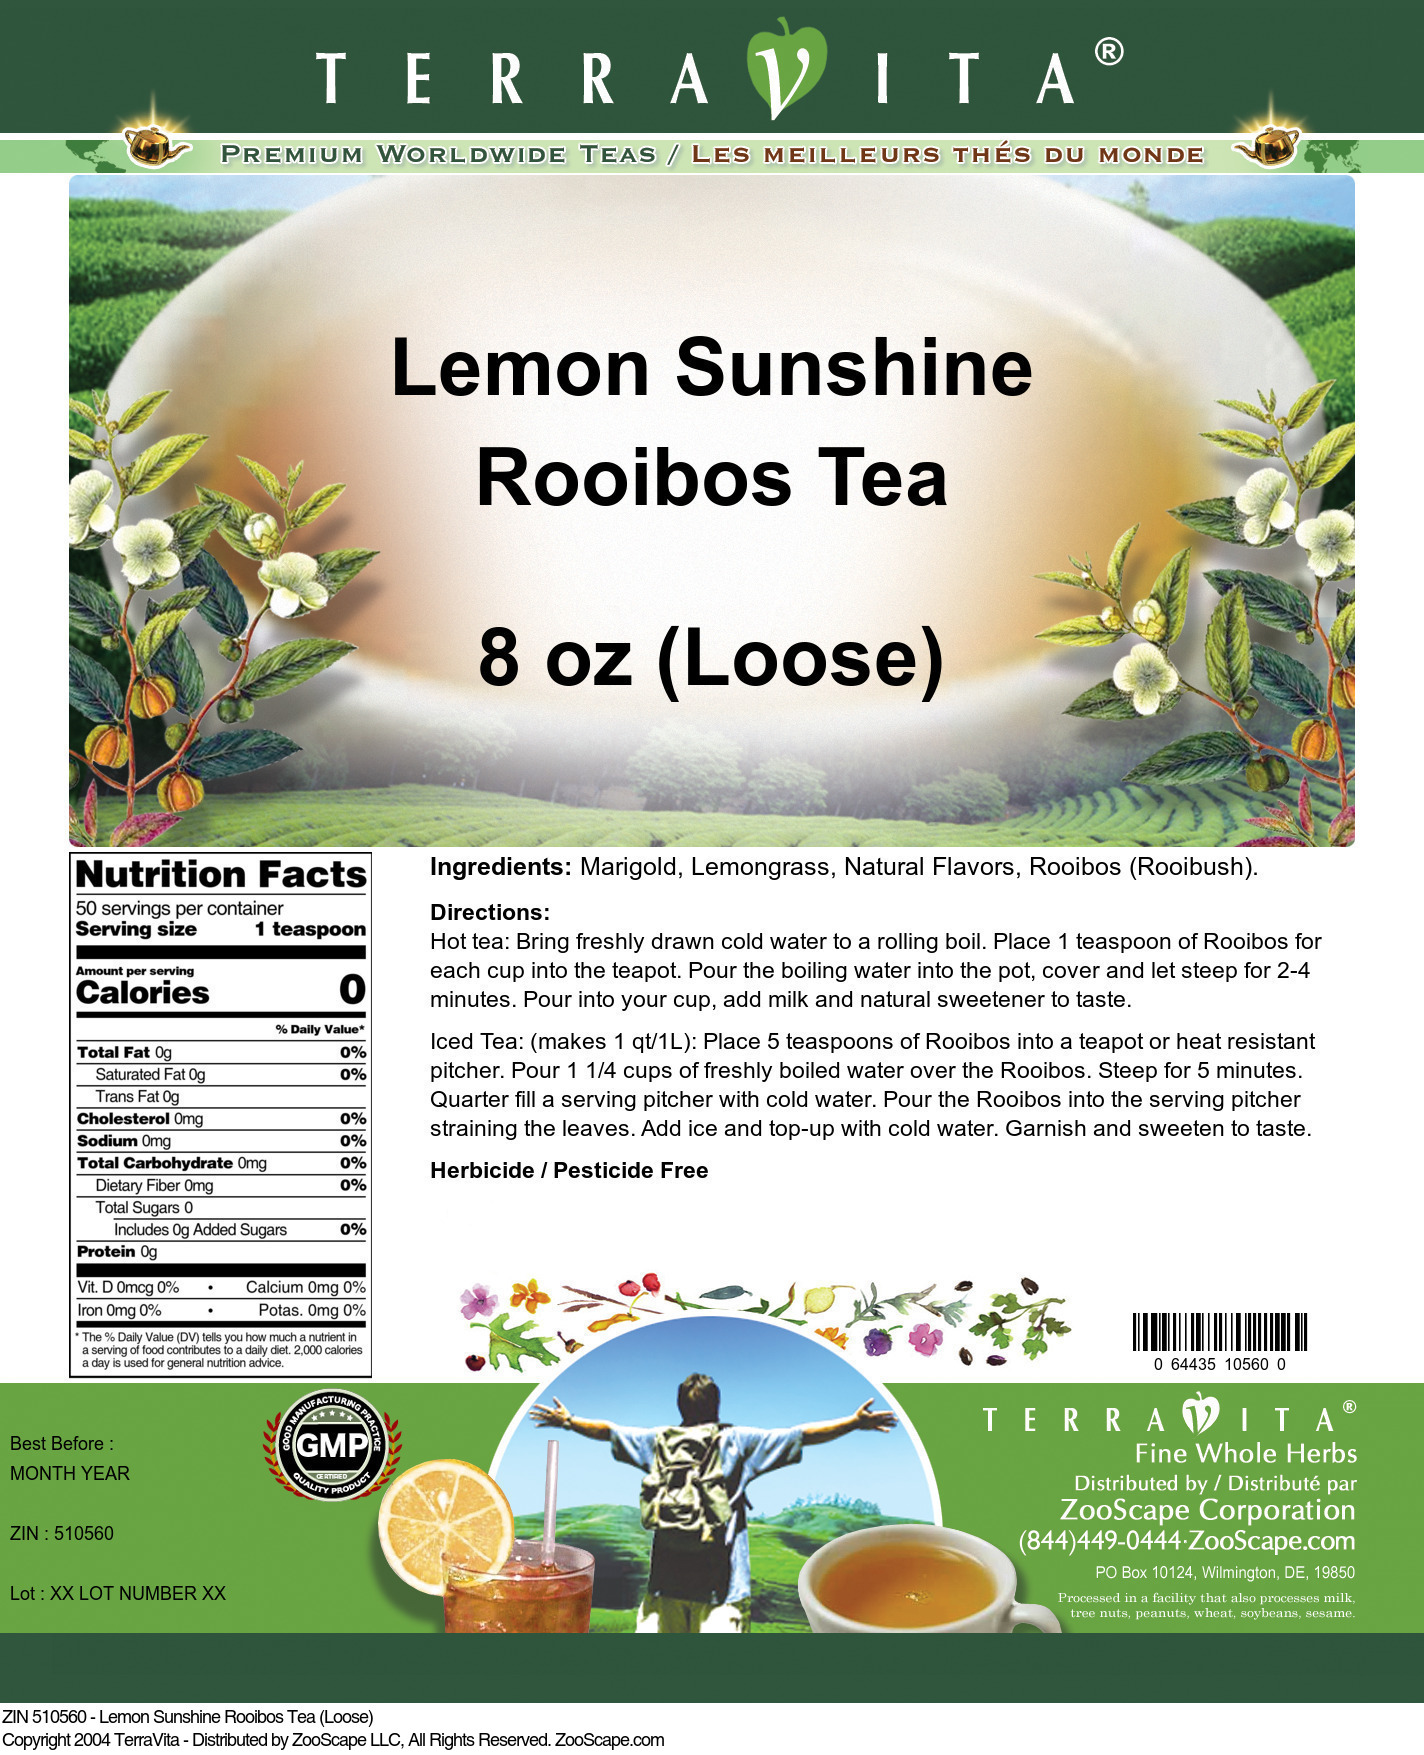 Lemon Sunshine Rooibos Tea (Loose)